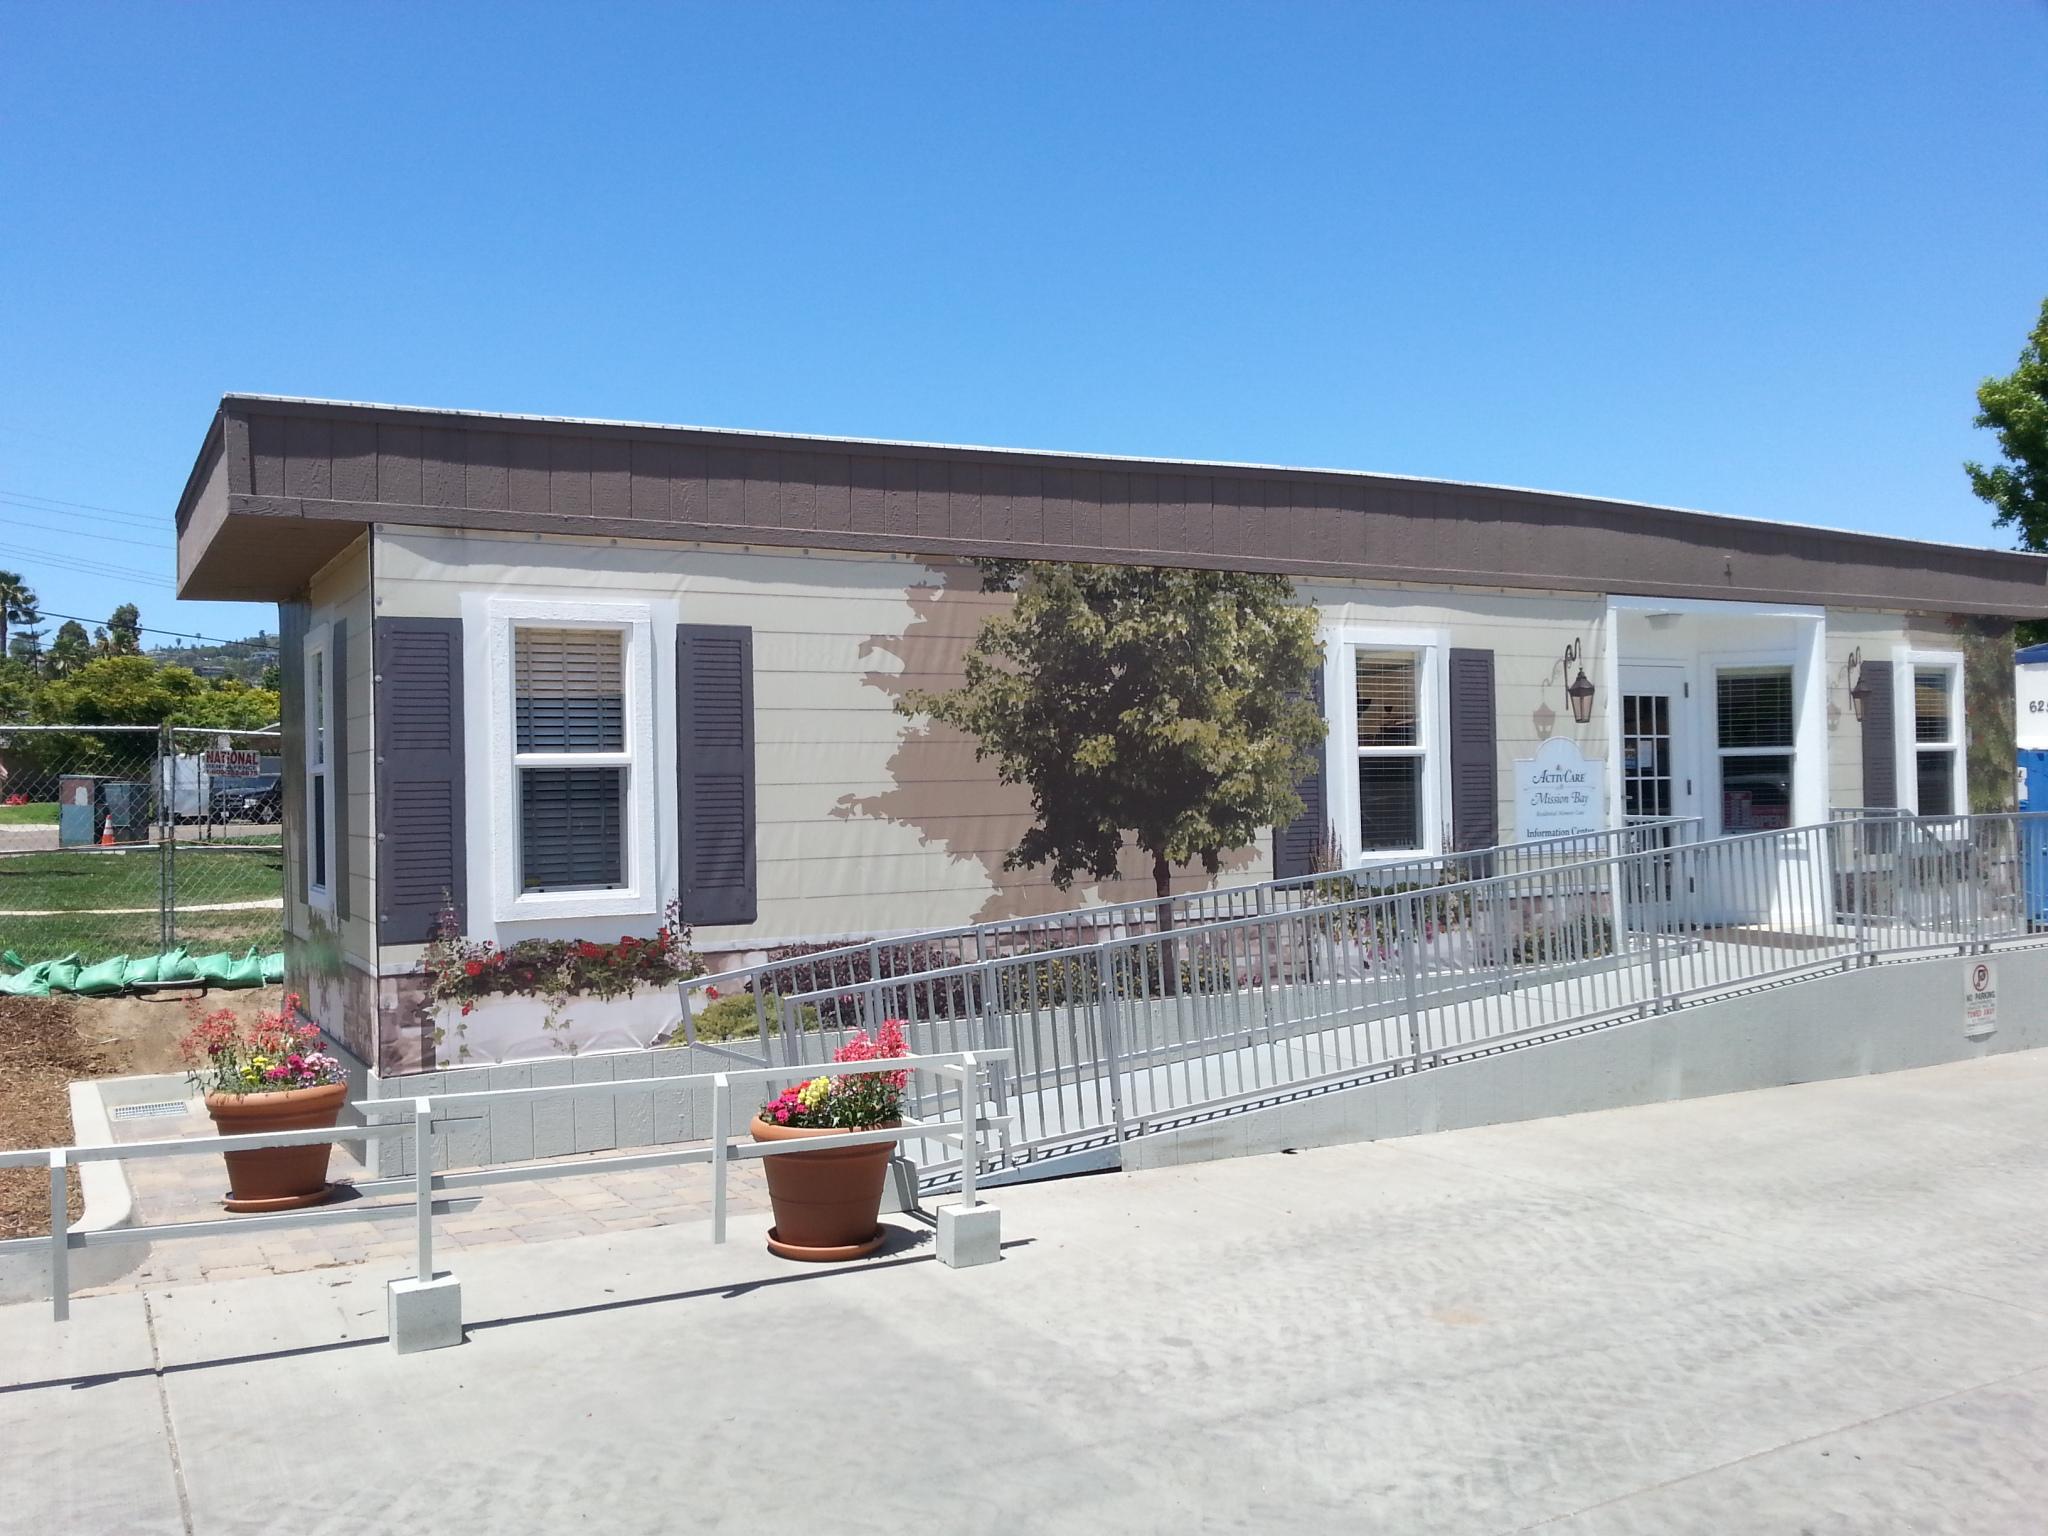 MB Information Center